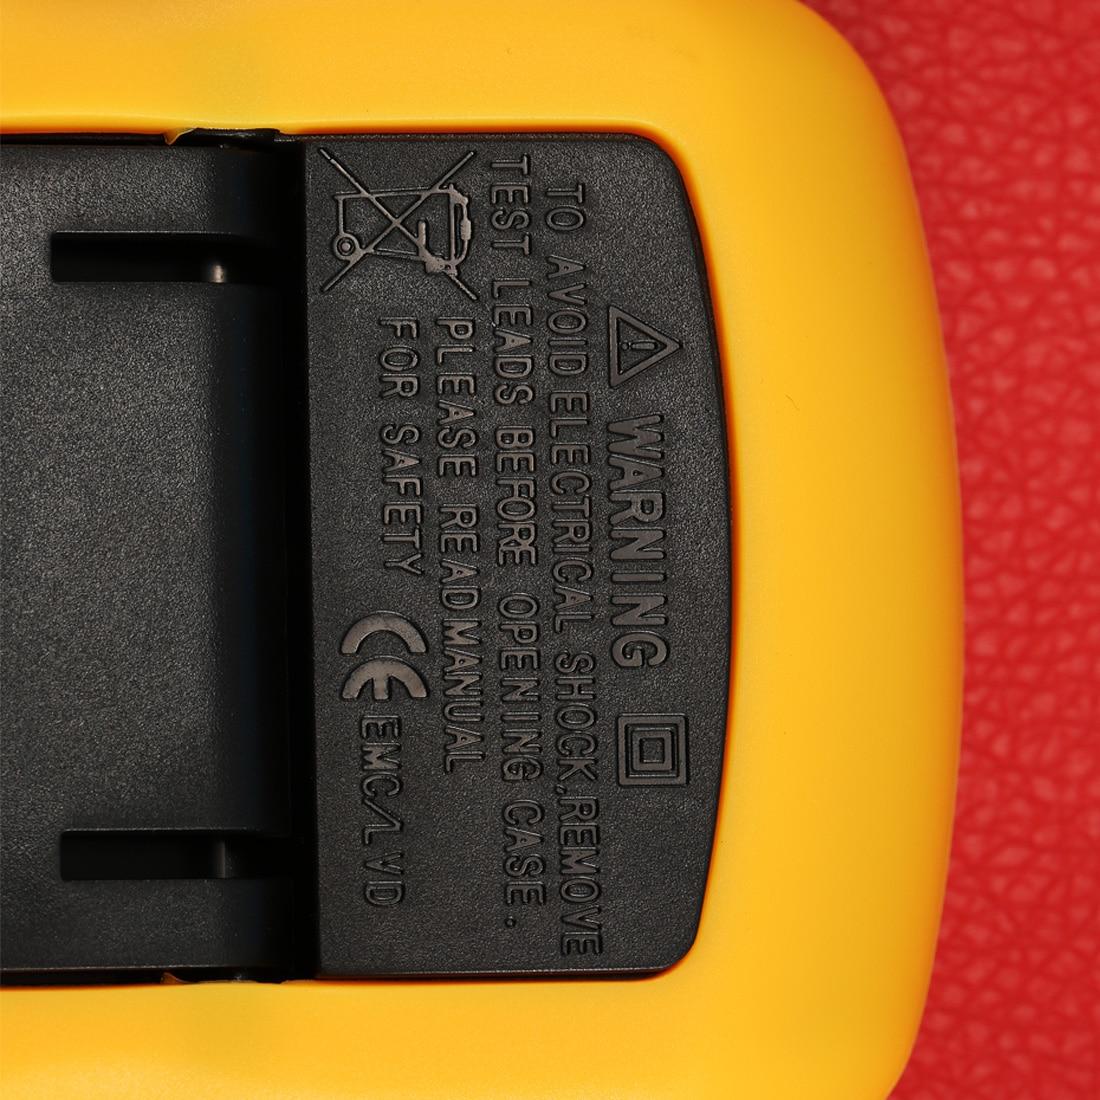 1pcs Handheld Counts Digital Lcd Multimeter Voltmeter Ammeter A830l Ohm Ac Dc Circuit Volt Tester Test Current High Quality Gallery Image